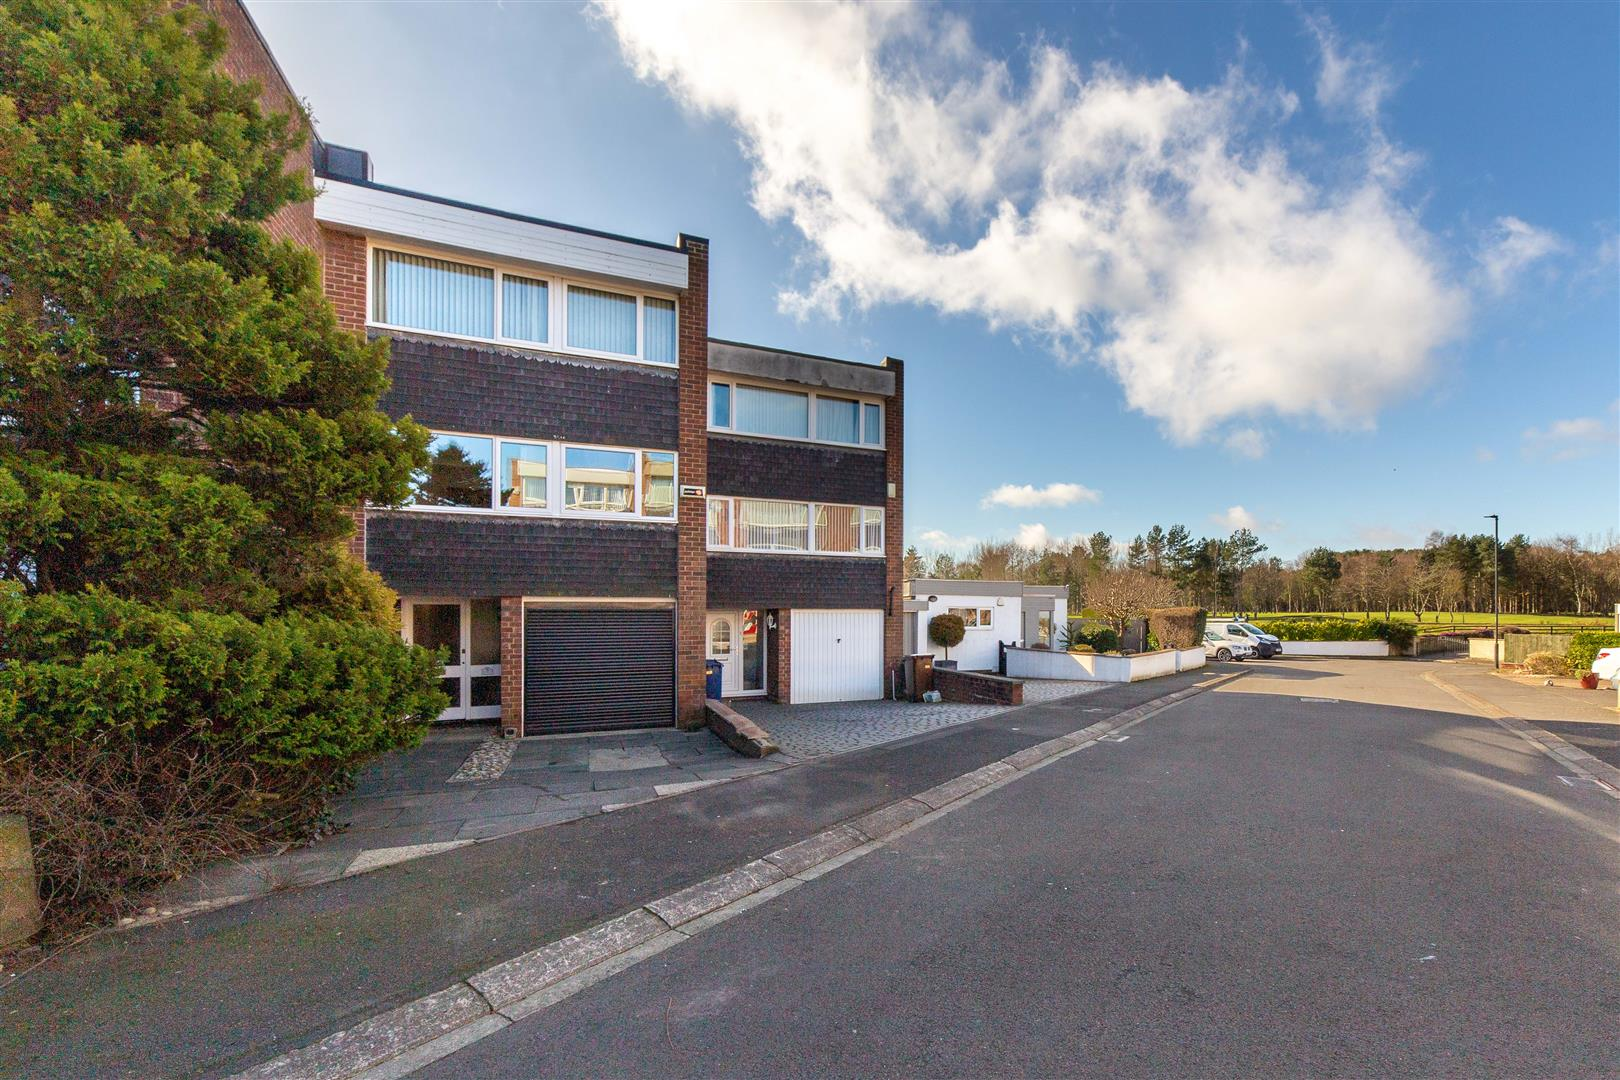 3 bed terraced house for sale in Fairway Close, Brunton Park, NE3